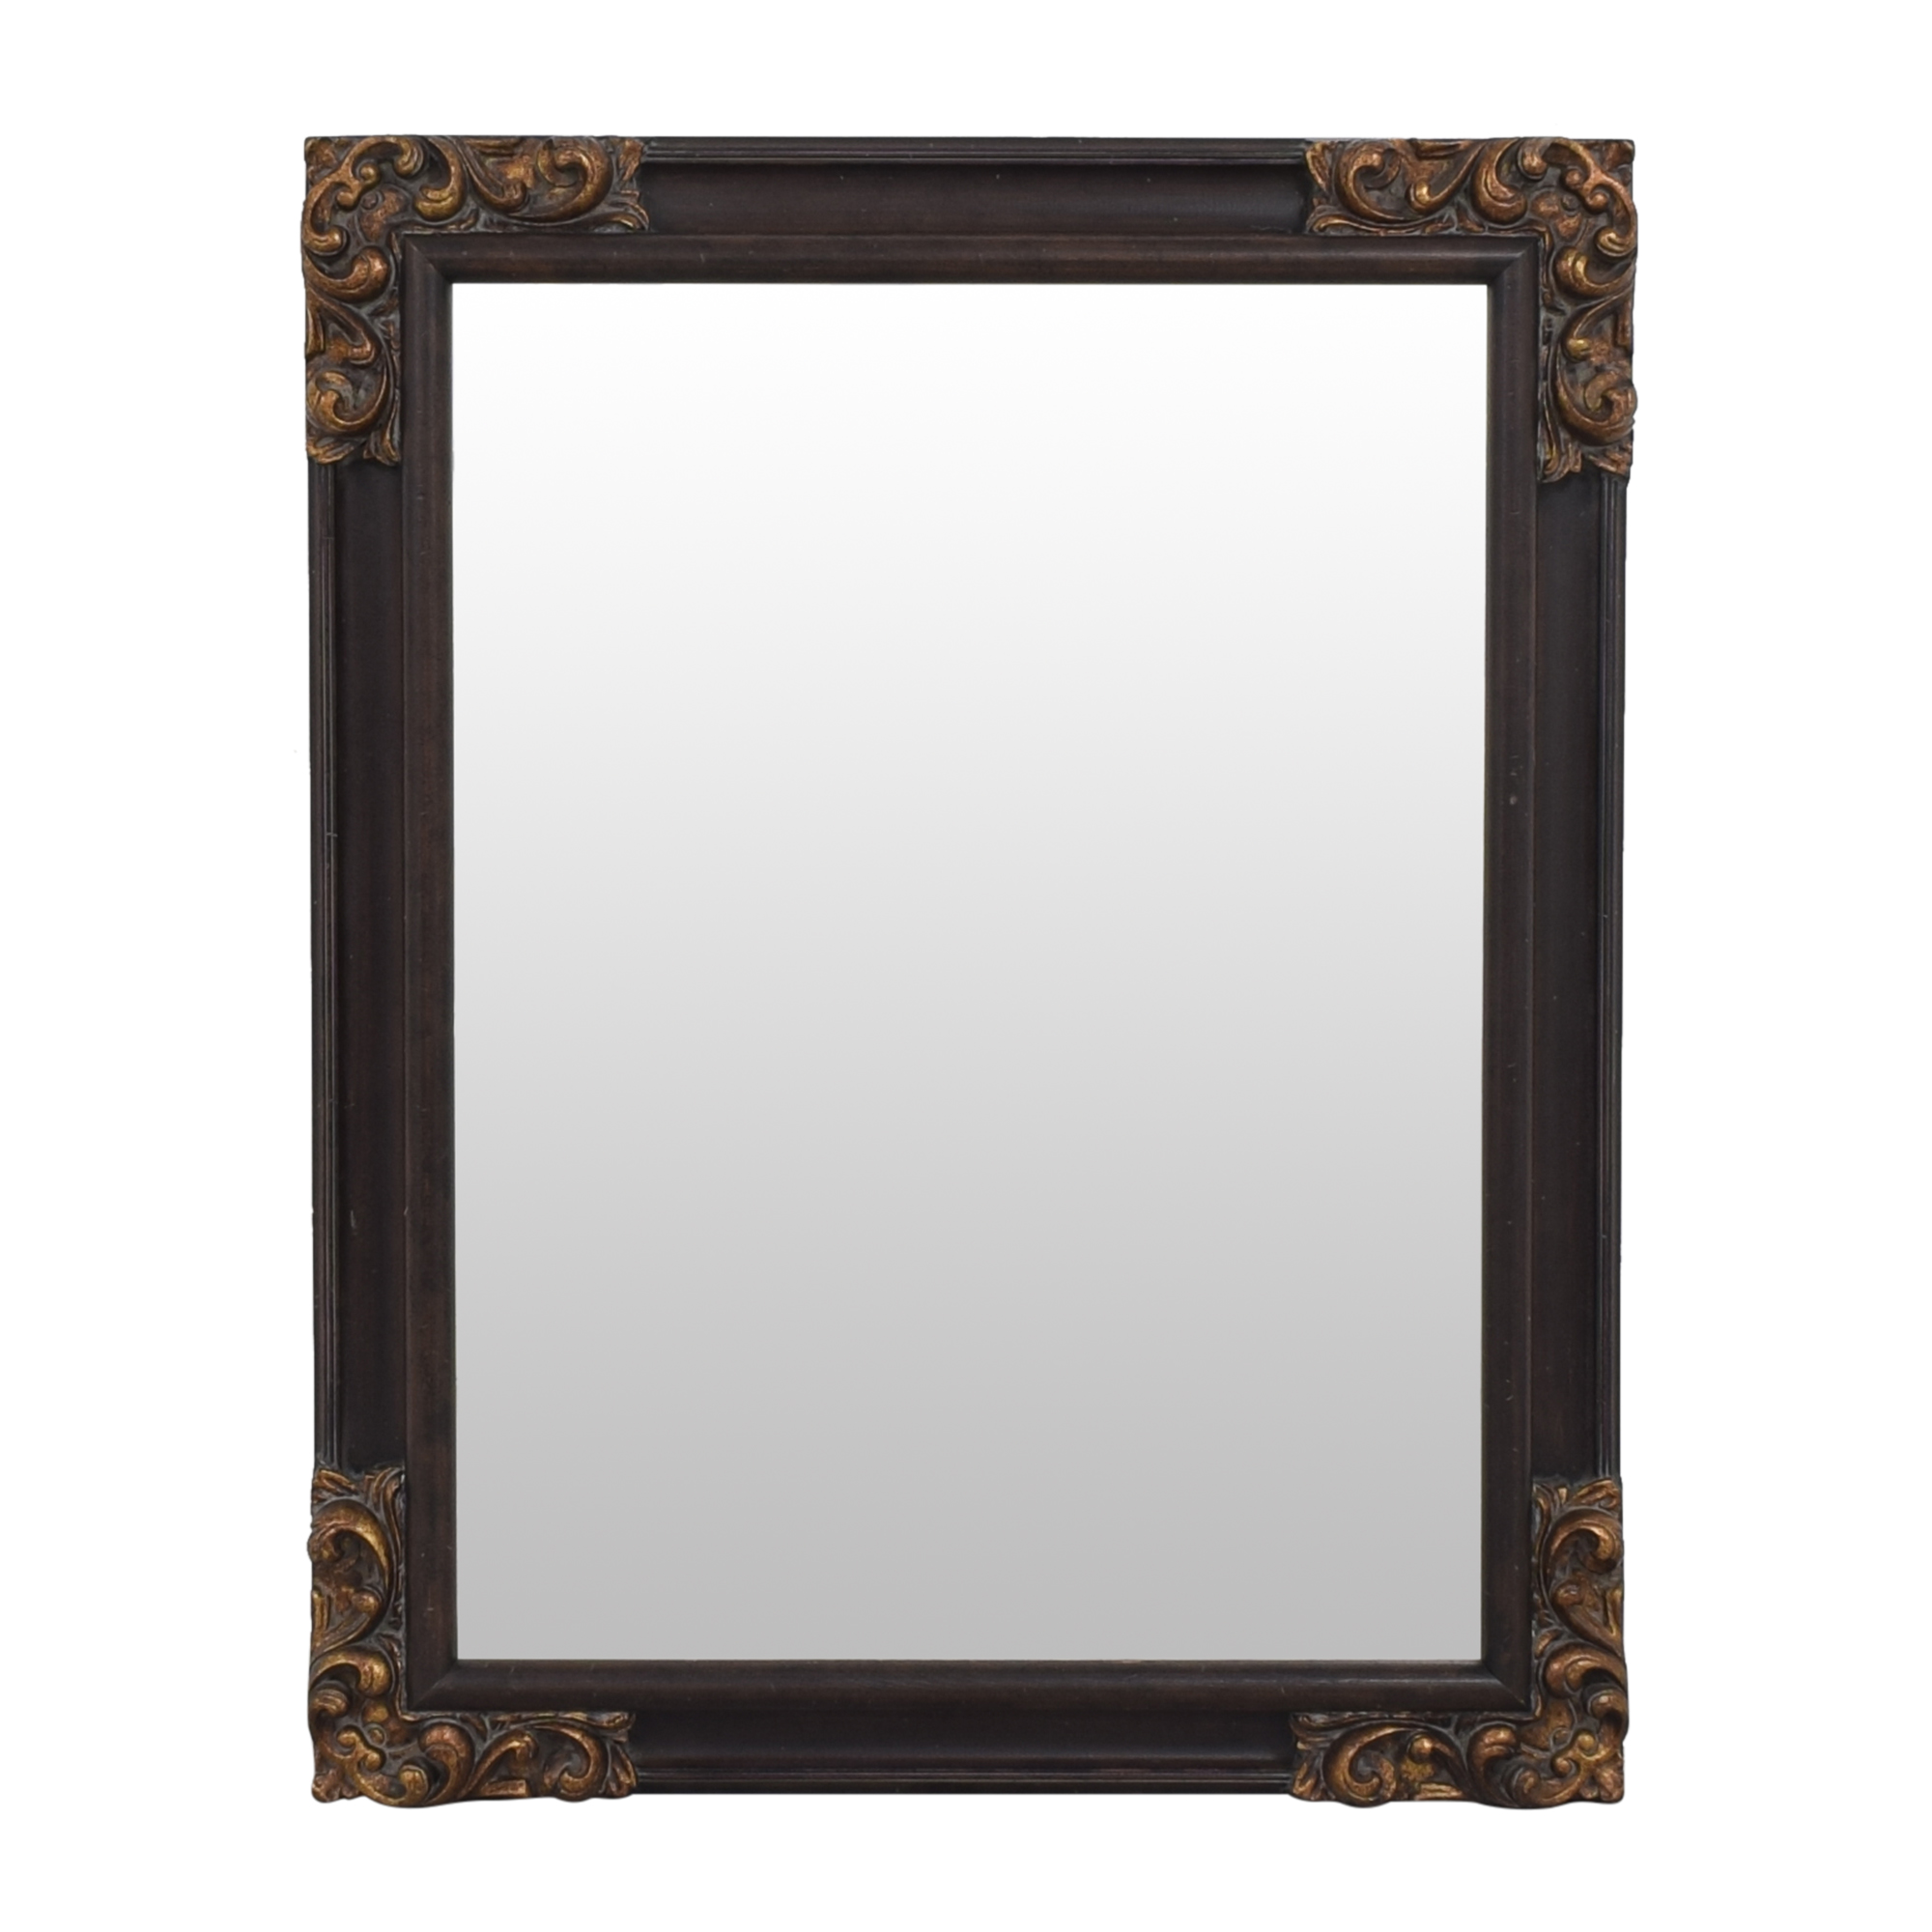 Windsor Art Windsor Art Wall Mirror for sale